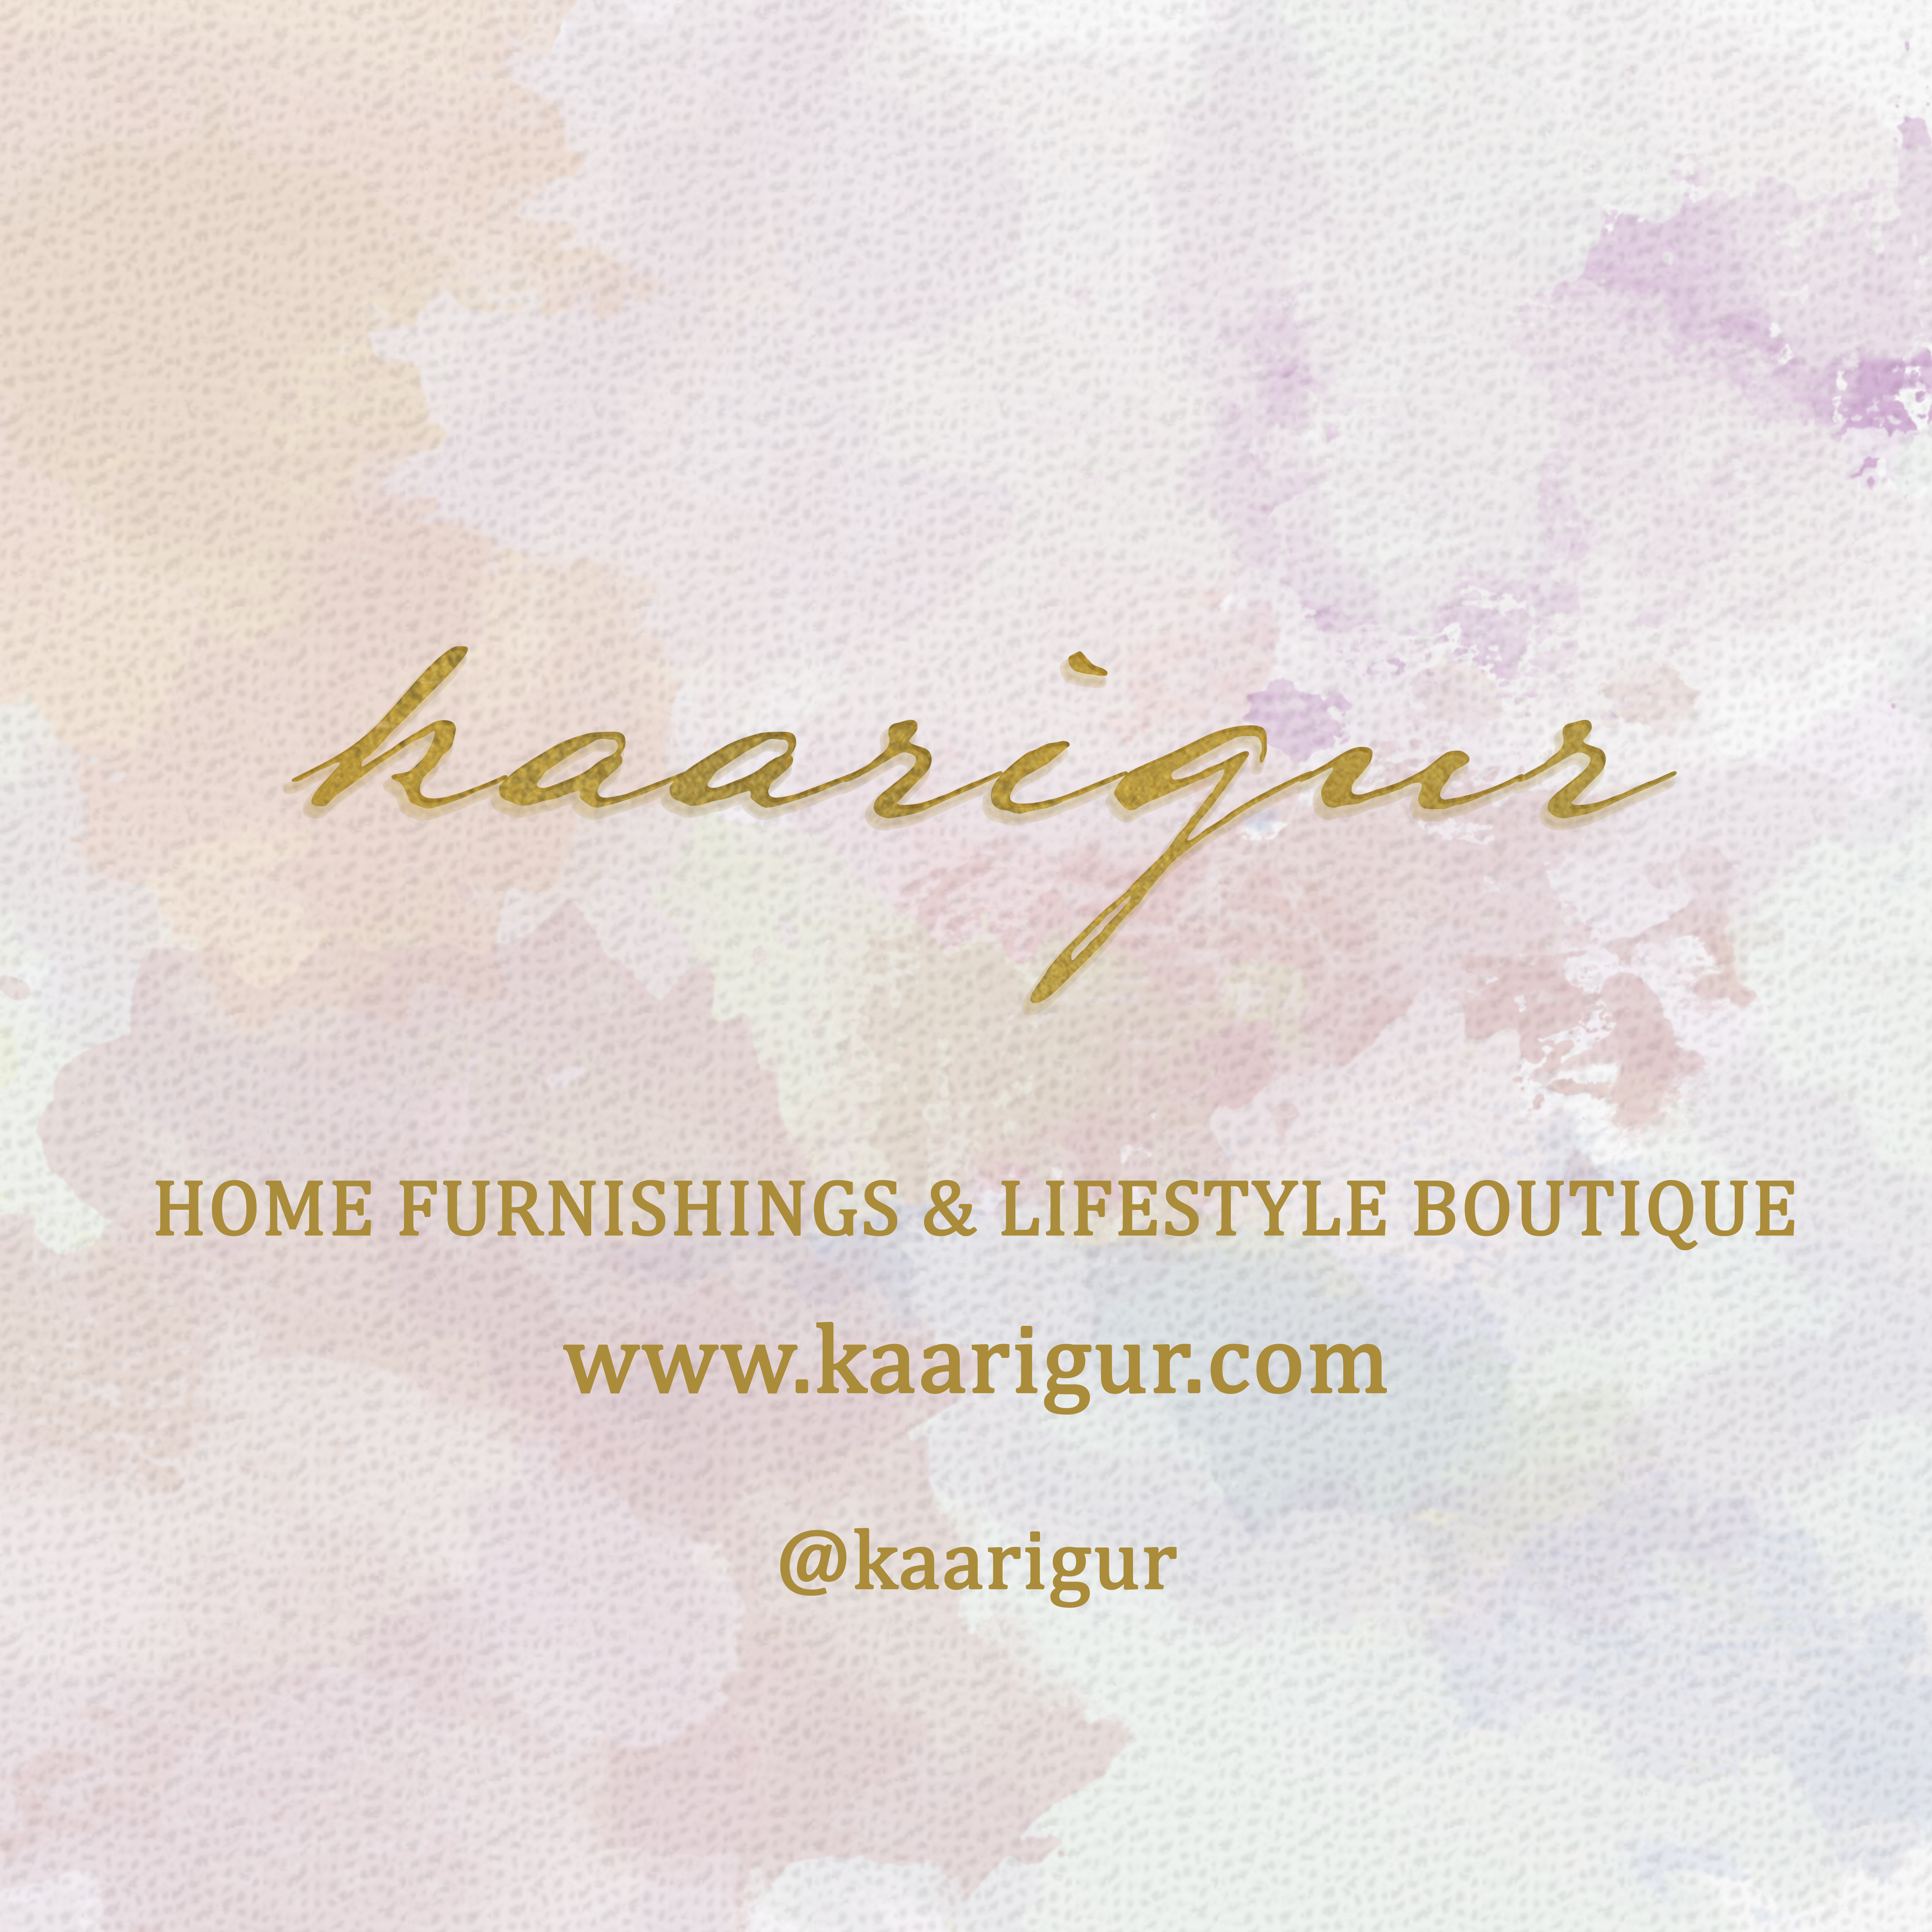 kaarigur, handcrafted home décor